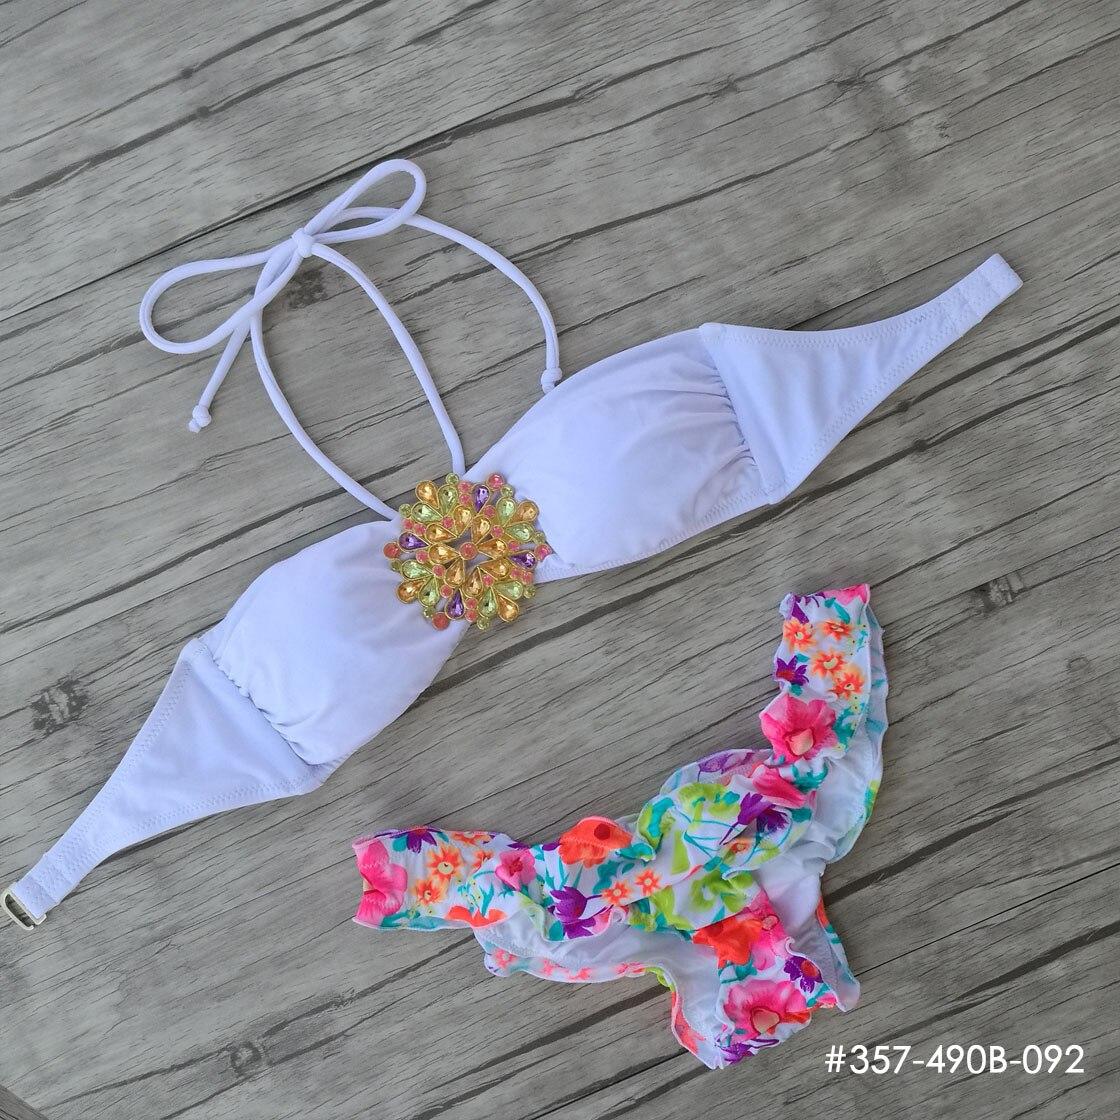 цена Custom Made Designs Secret Crystal Diamond Bikini Set White TOP Swimwear Women Swimsuit 2018 Biquini Print Red Floral Bottom онлайн в 2017 году